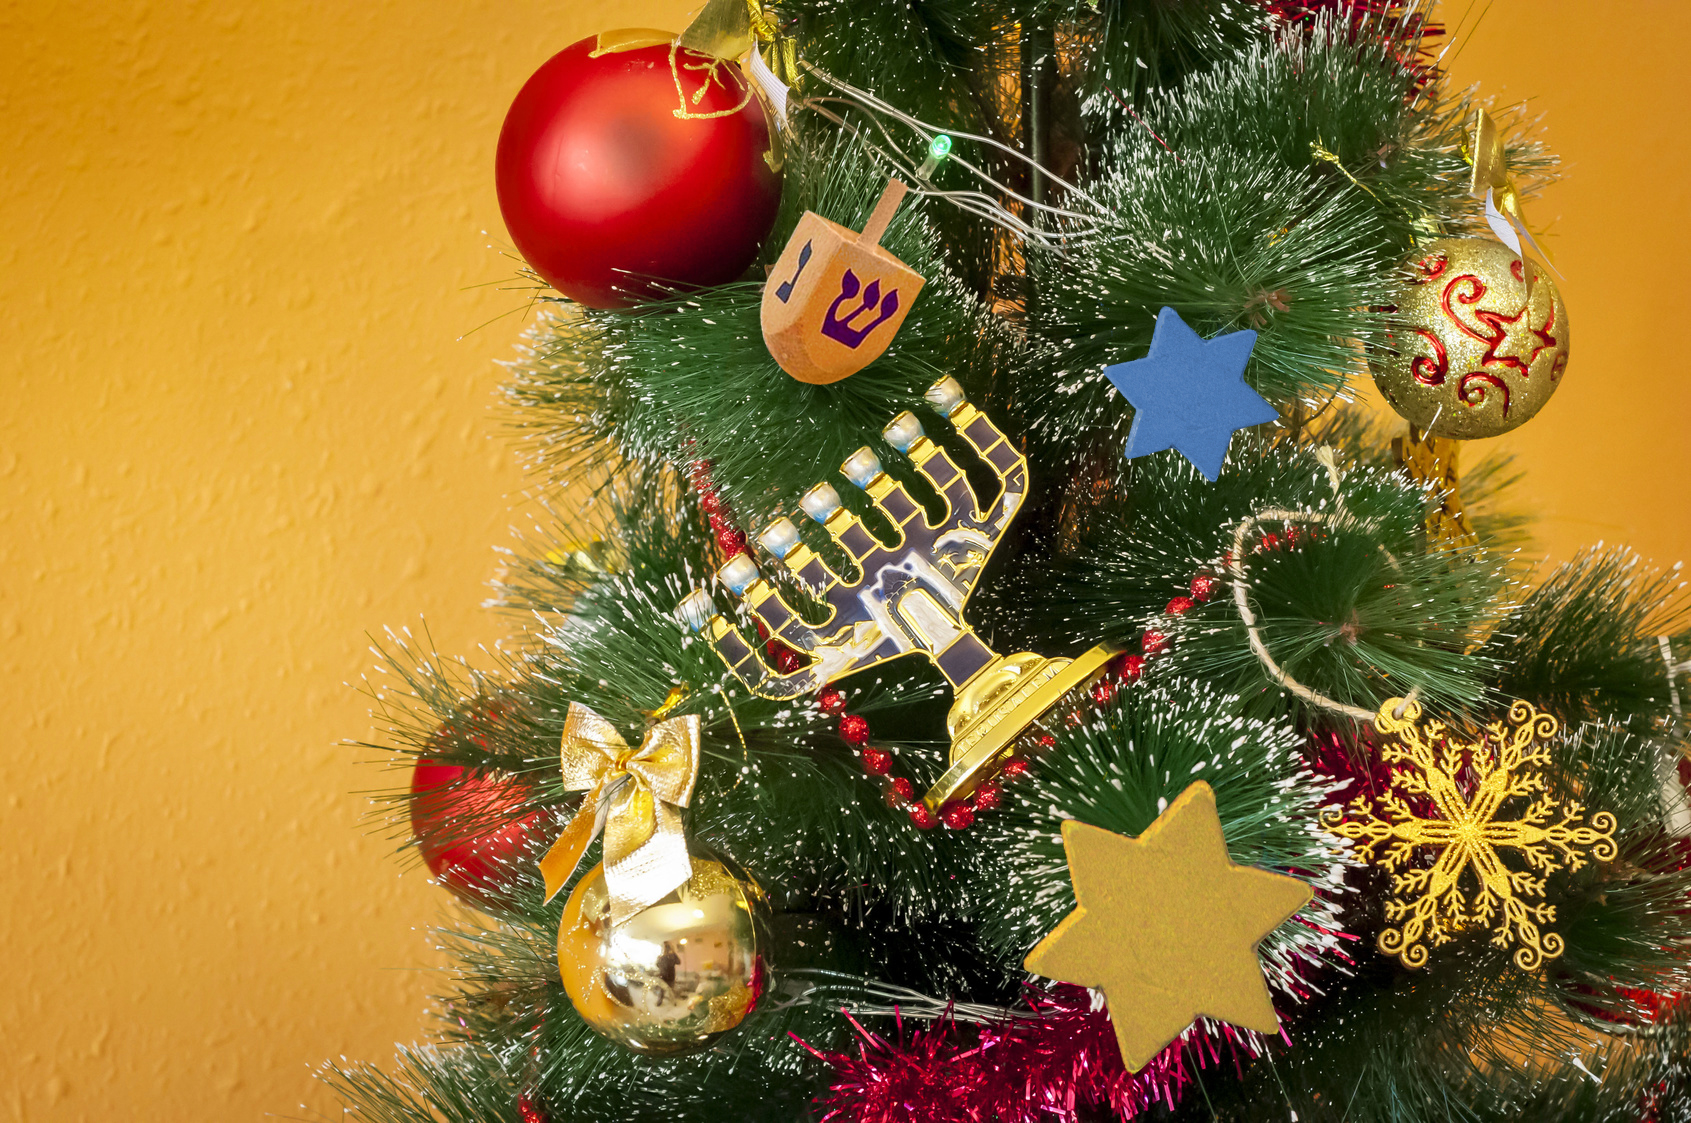 Jews Christmas Trees.Is It Kosher To Have A Chanukah Bush Jewish Week